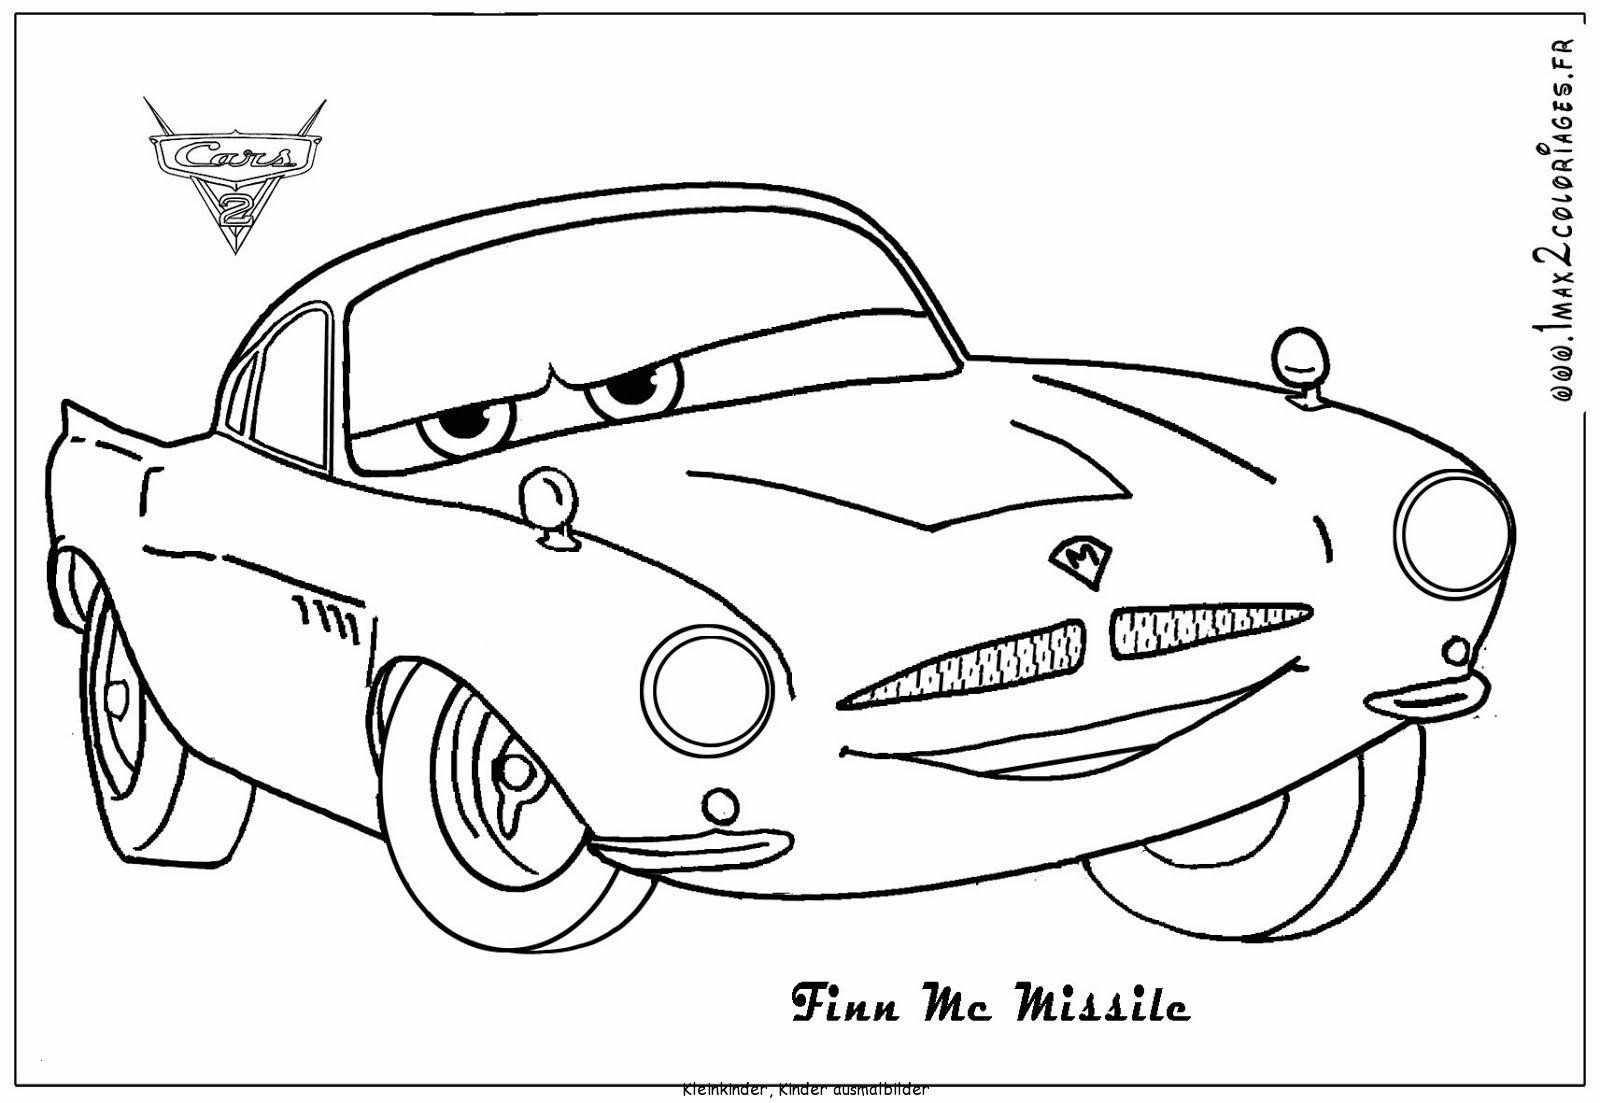 Lightning Mcqueen Ausmalen Genial Awesome Colouring Disney Cars Genial Cars Ausmalbilder Lightning Das Bild